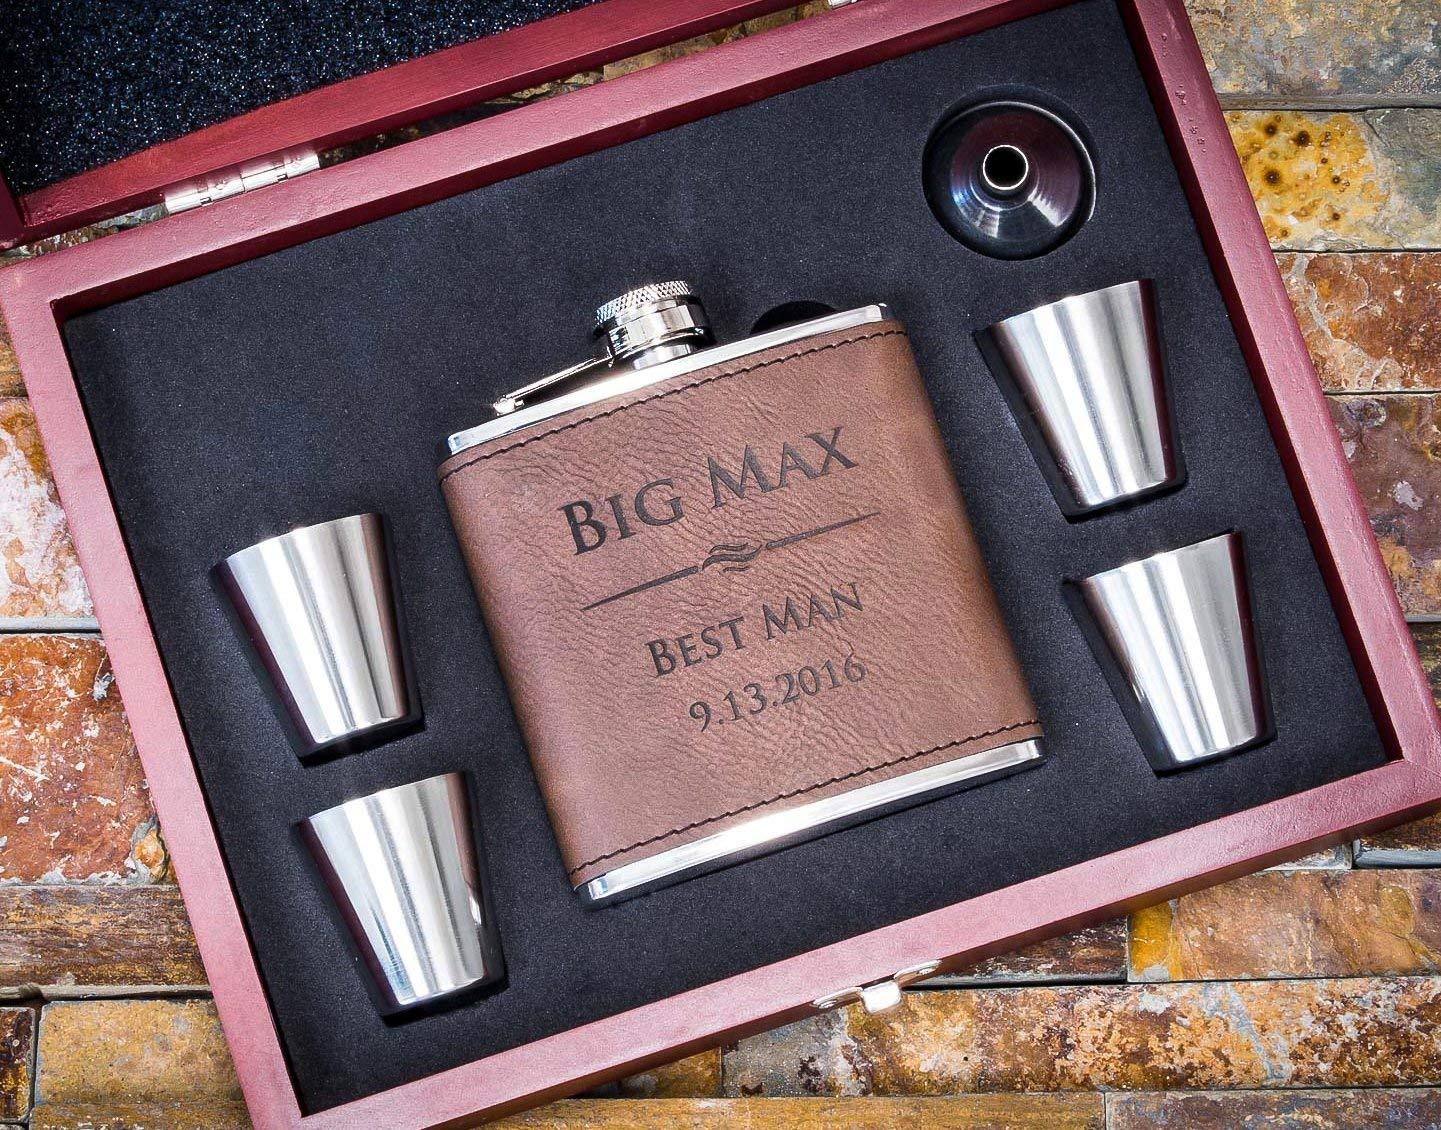 Personalized Dark Brown Leather Flask Wood Box Set- Groomsmen Gift- Custom Engraved Hip Flasks, Groomsman Whiskey Gifts For Men, Rustic Customized Vegan Wrapped #304 Steel 6 oz FSK11